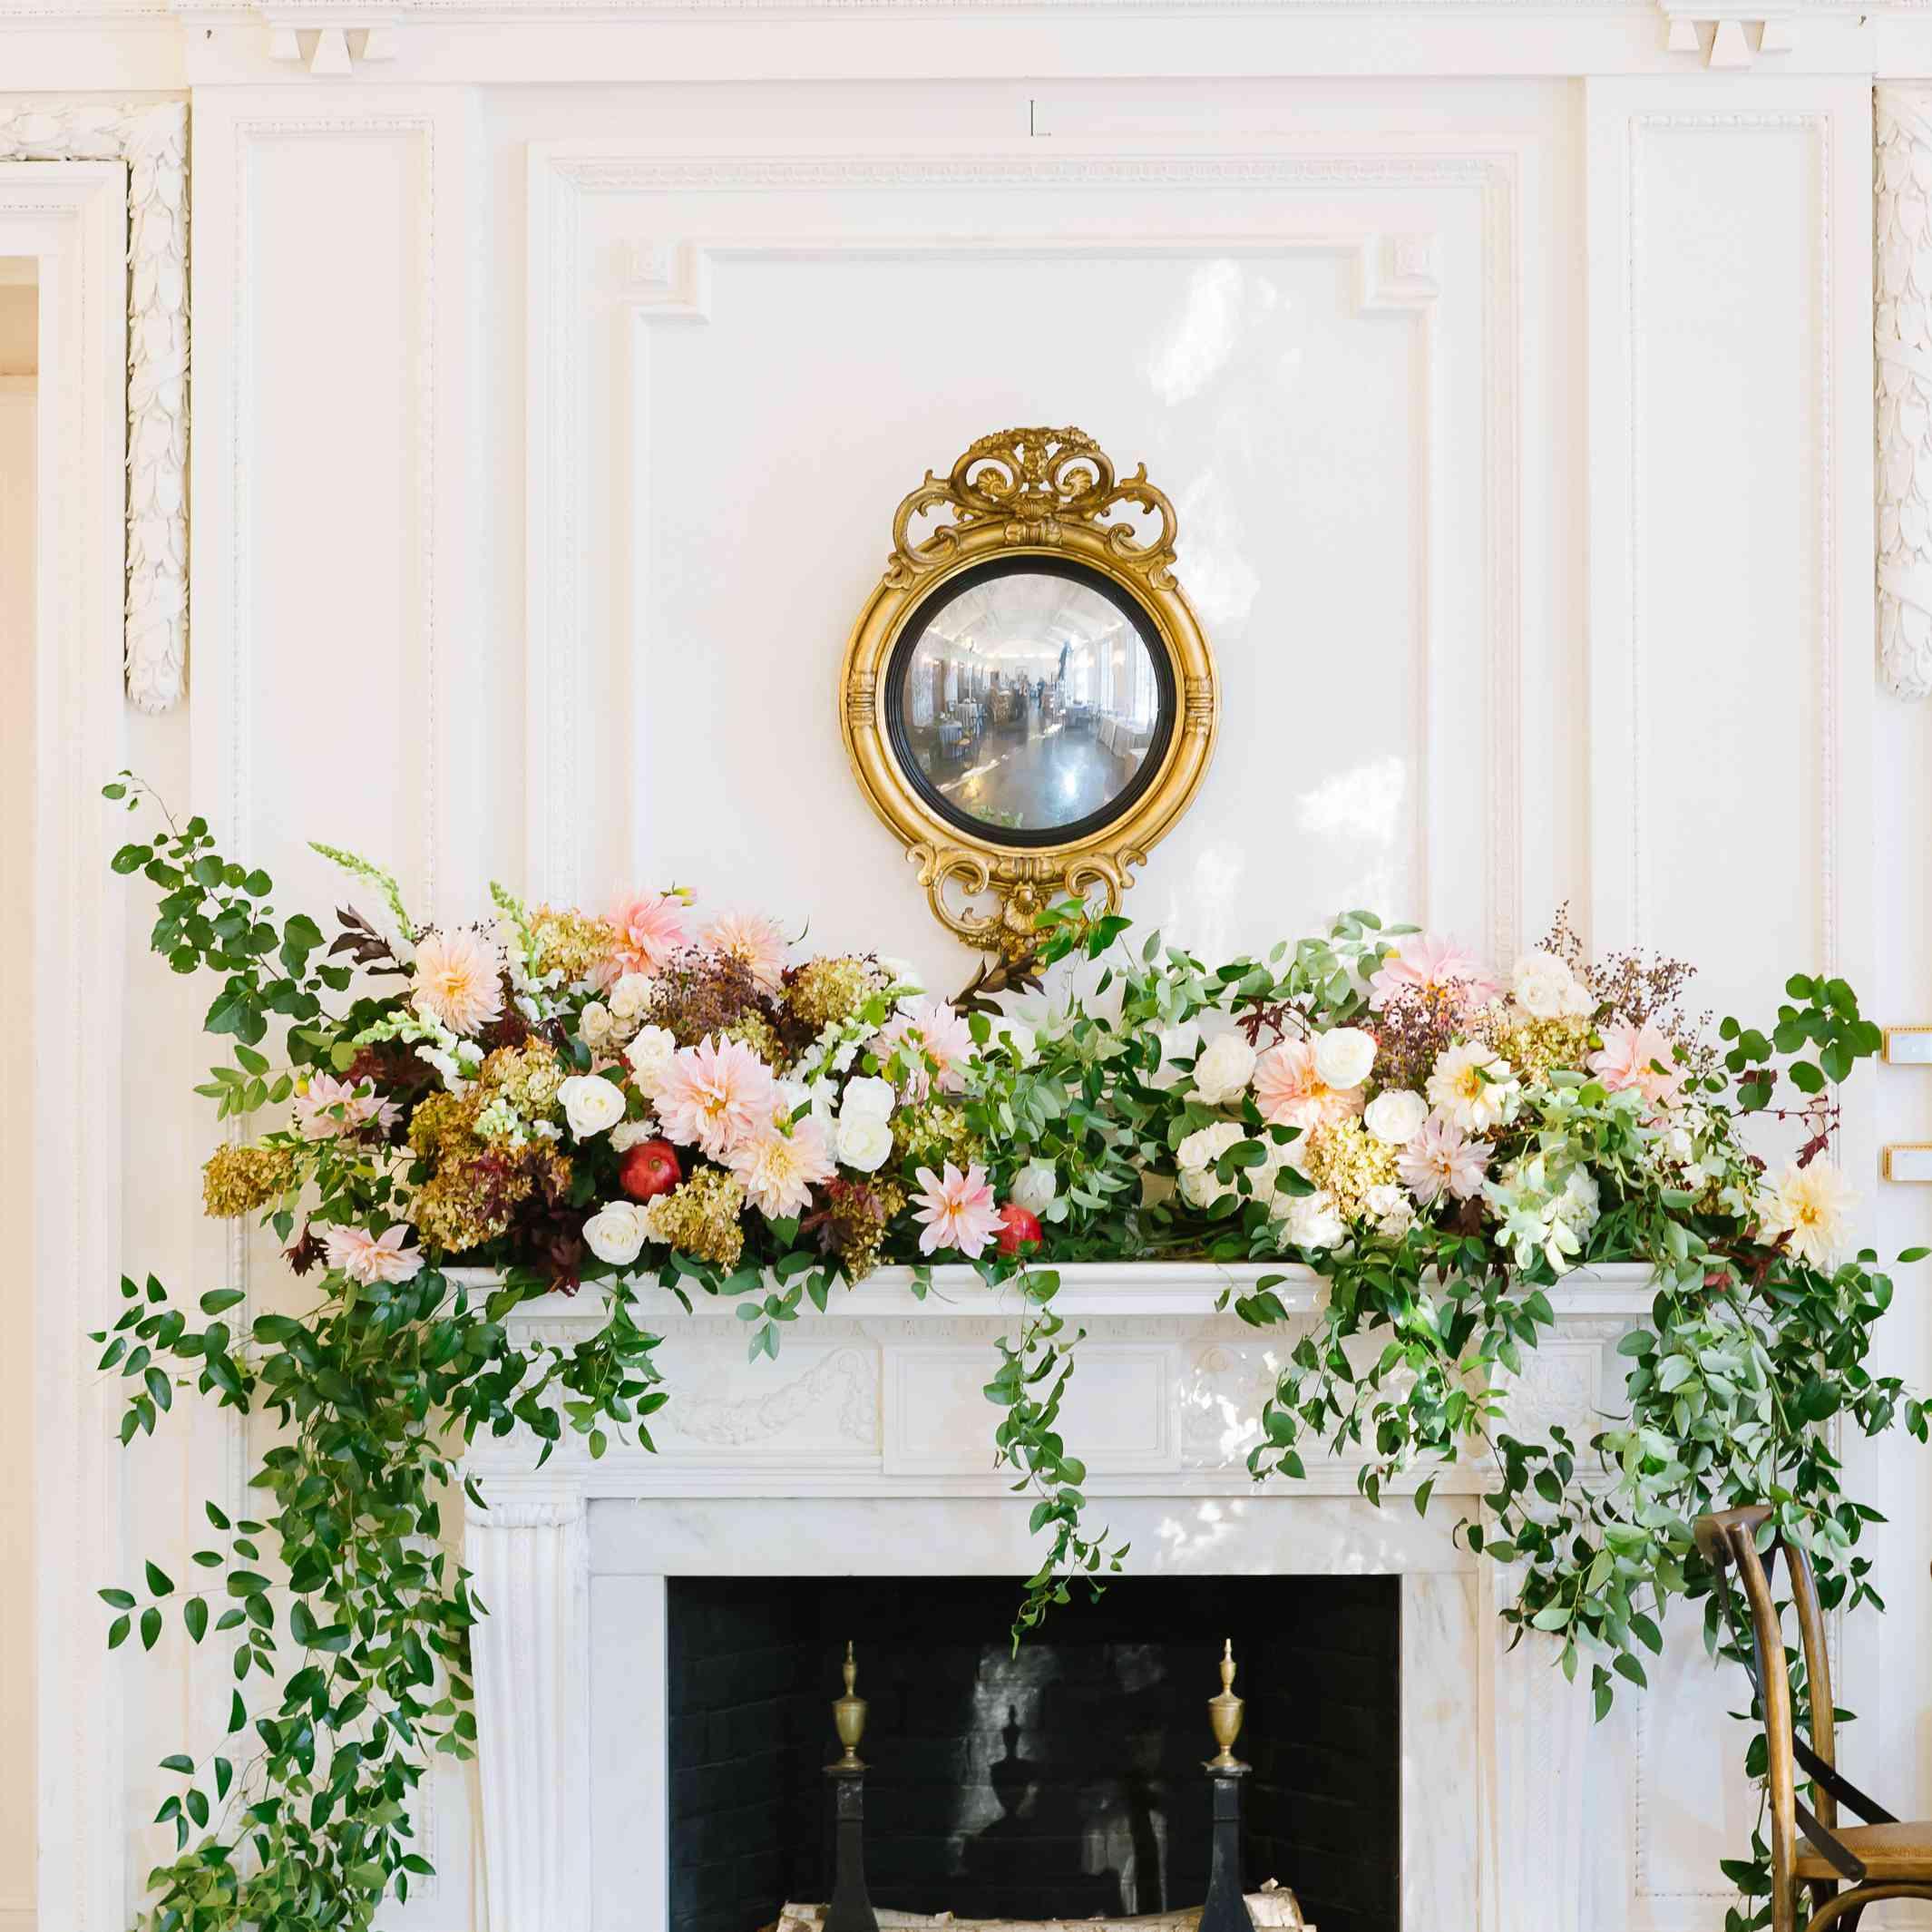 Bountiful floral arrangement on fireplace